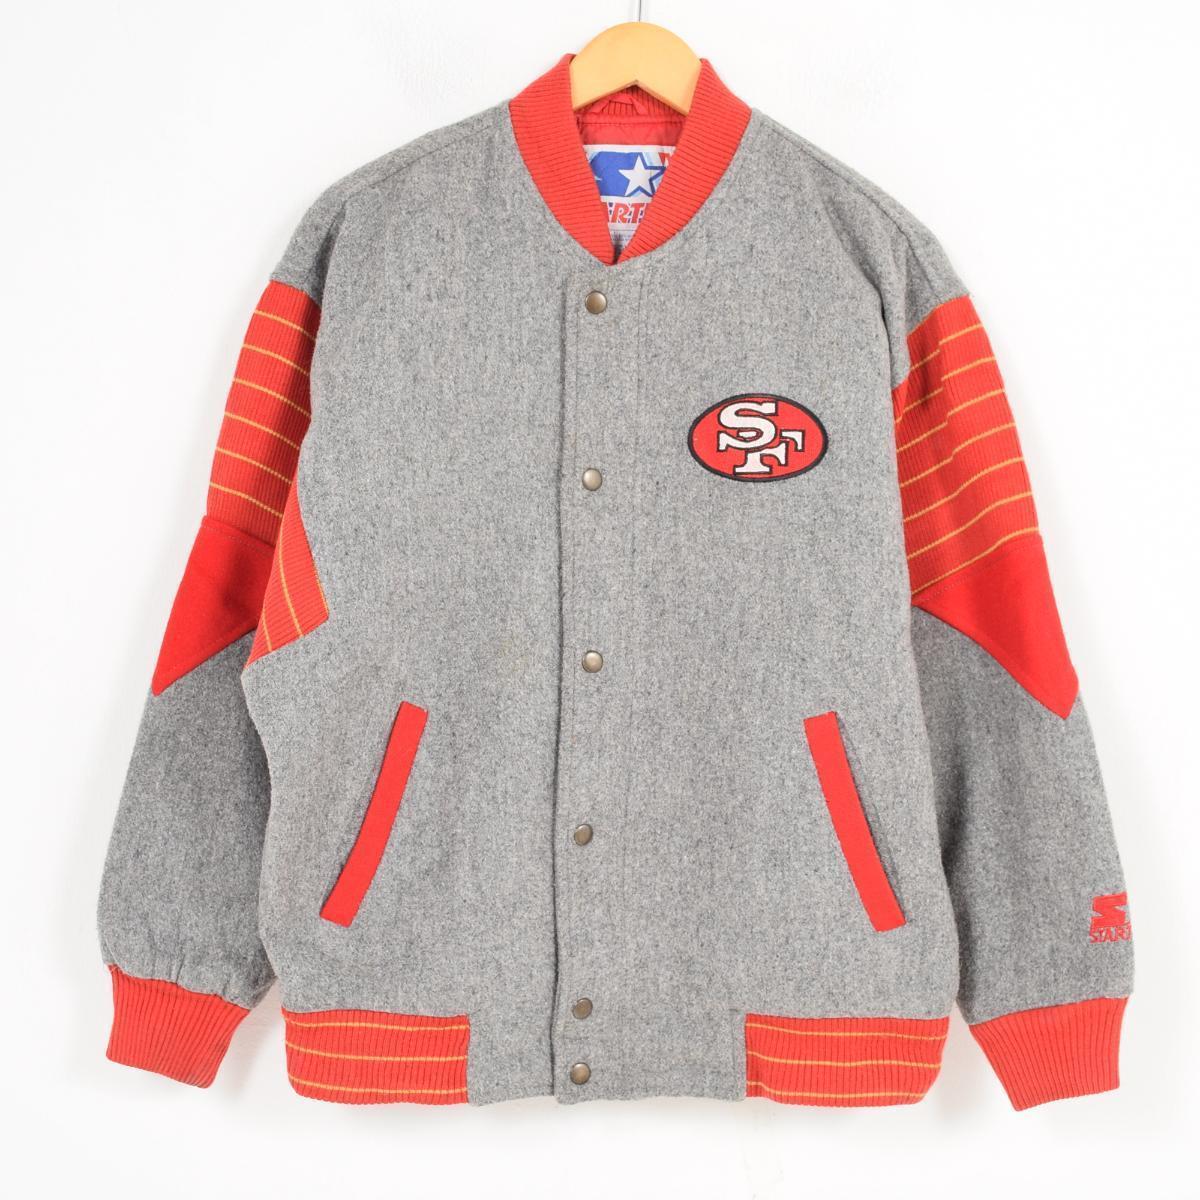 best cheap f953b 11246 90s starter Starter NFL SAN FRANCISCO 49ERS San Francisco 49ers reshuffling  wool award jacket Award jacket men M /wag8237